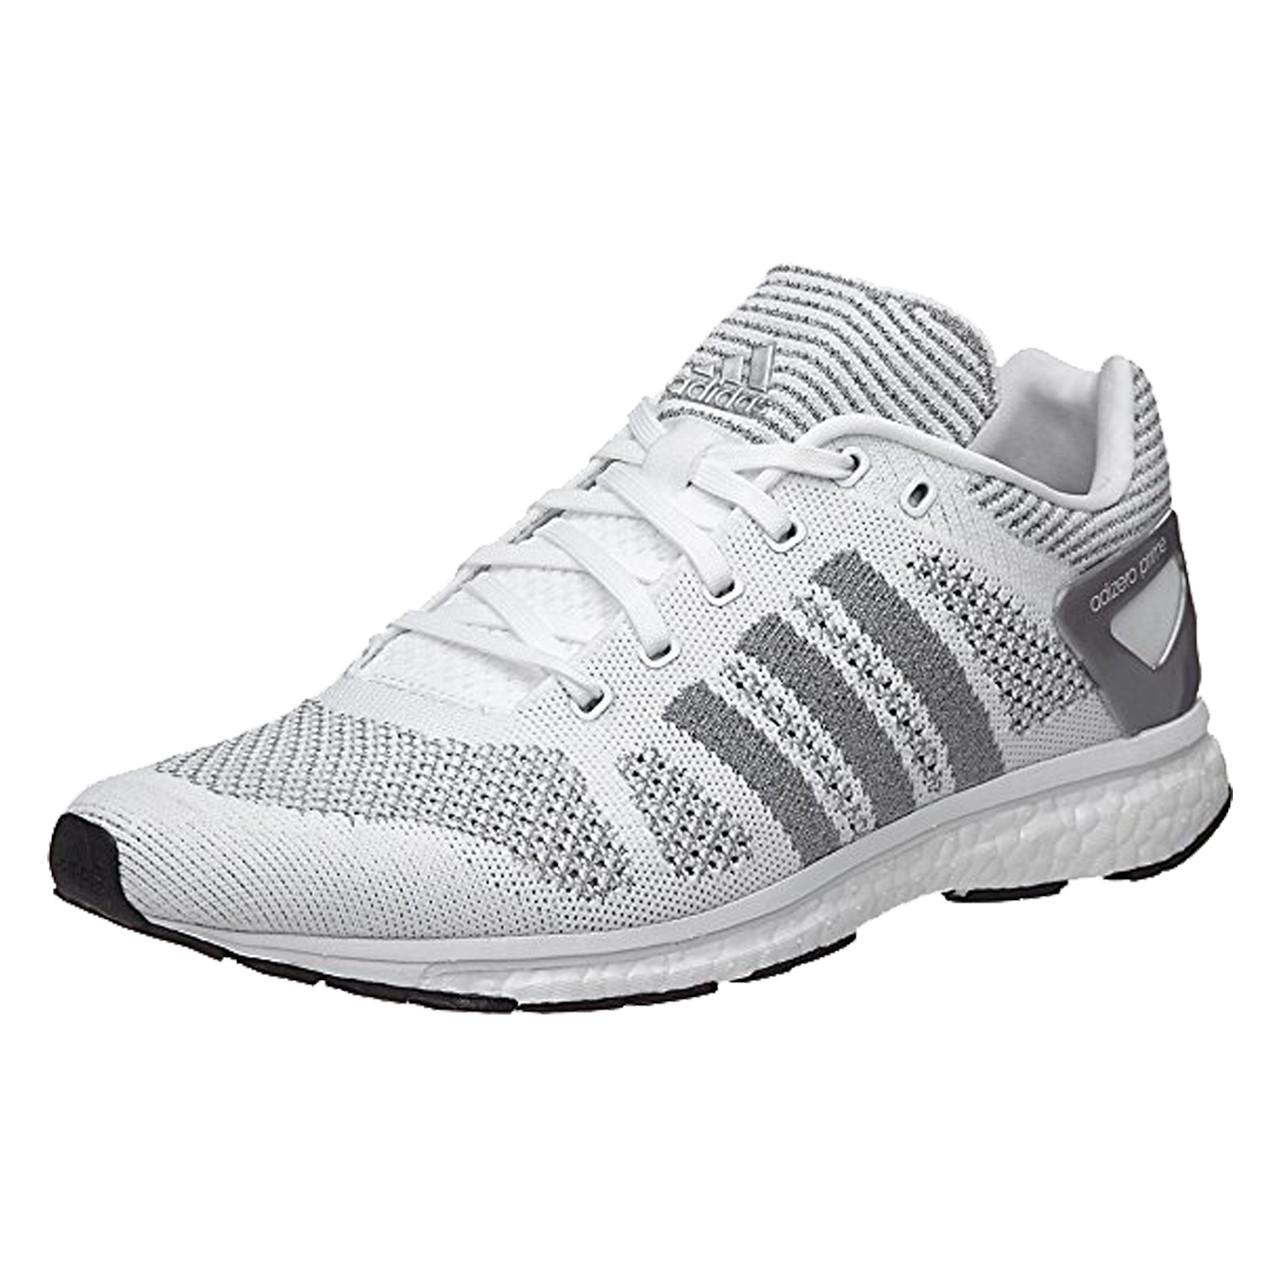 new styles 41061 72c69 ... Adidas Adizero Primeknit Limited Edition Men s Running Shoes BB4919 ...